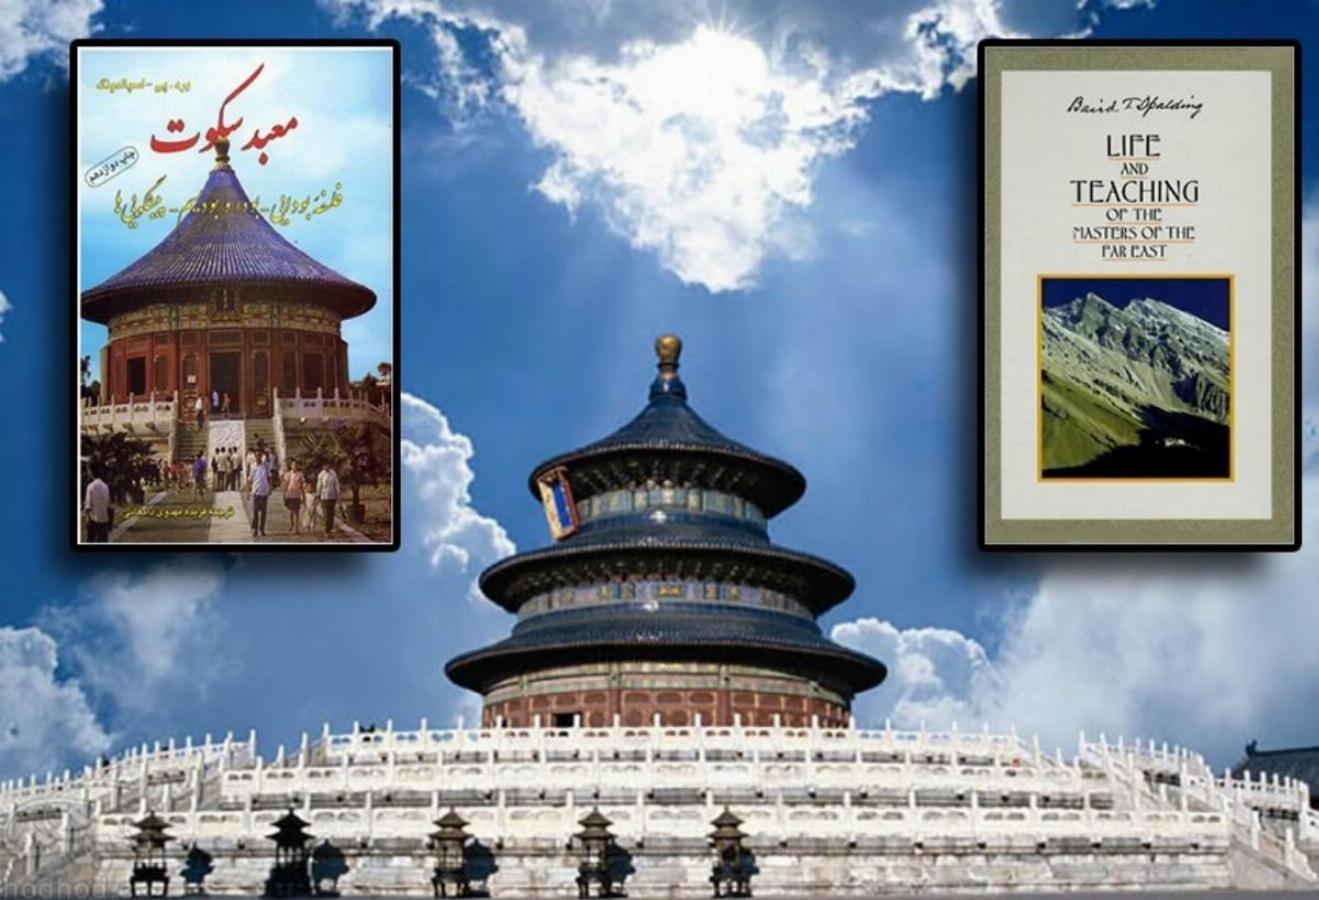 معرفی کتاب معبد سکوت اثر برد اسپالدینگ